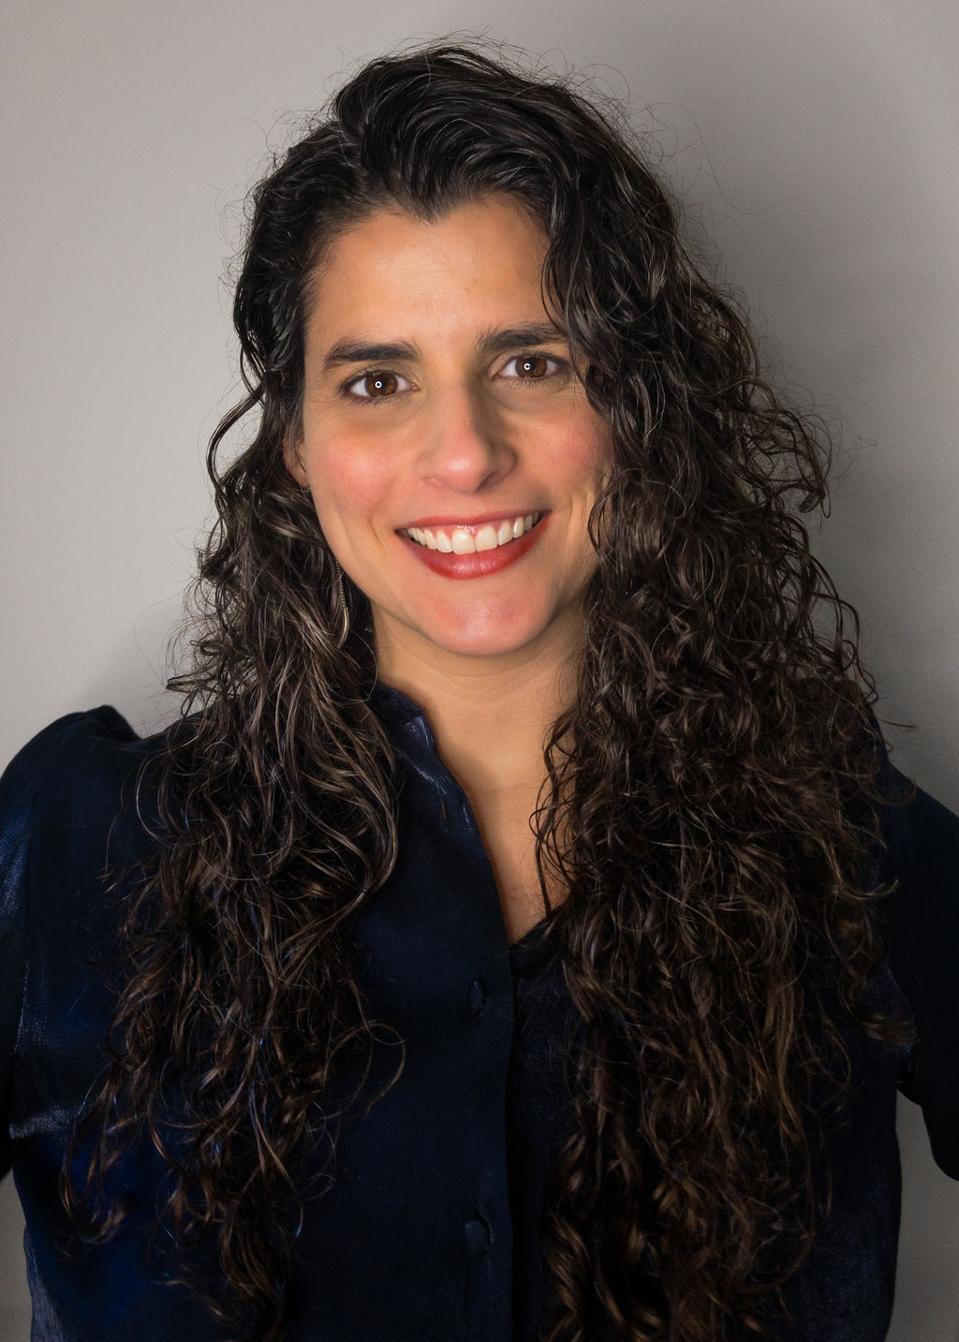 Nowhere co-founder Ana Constantino